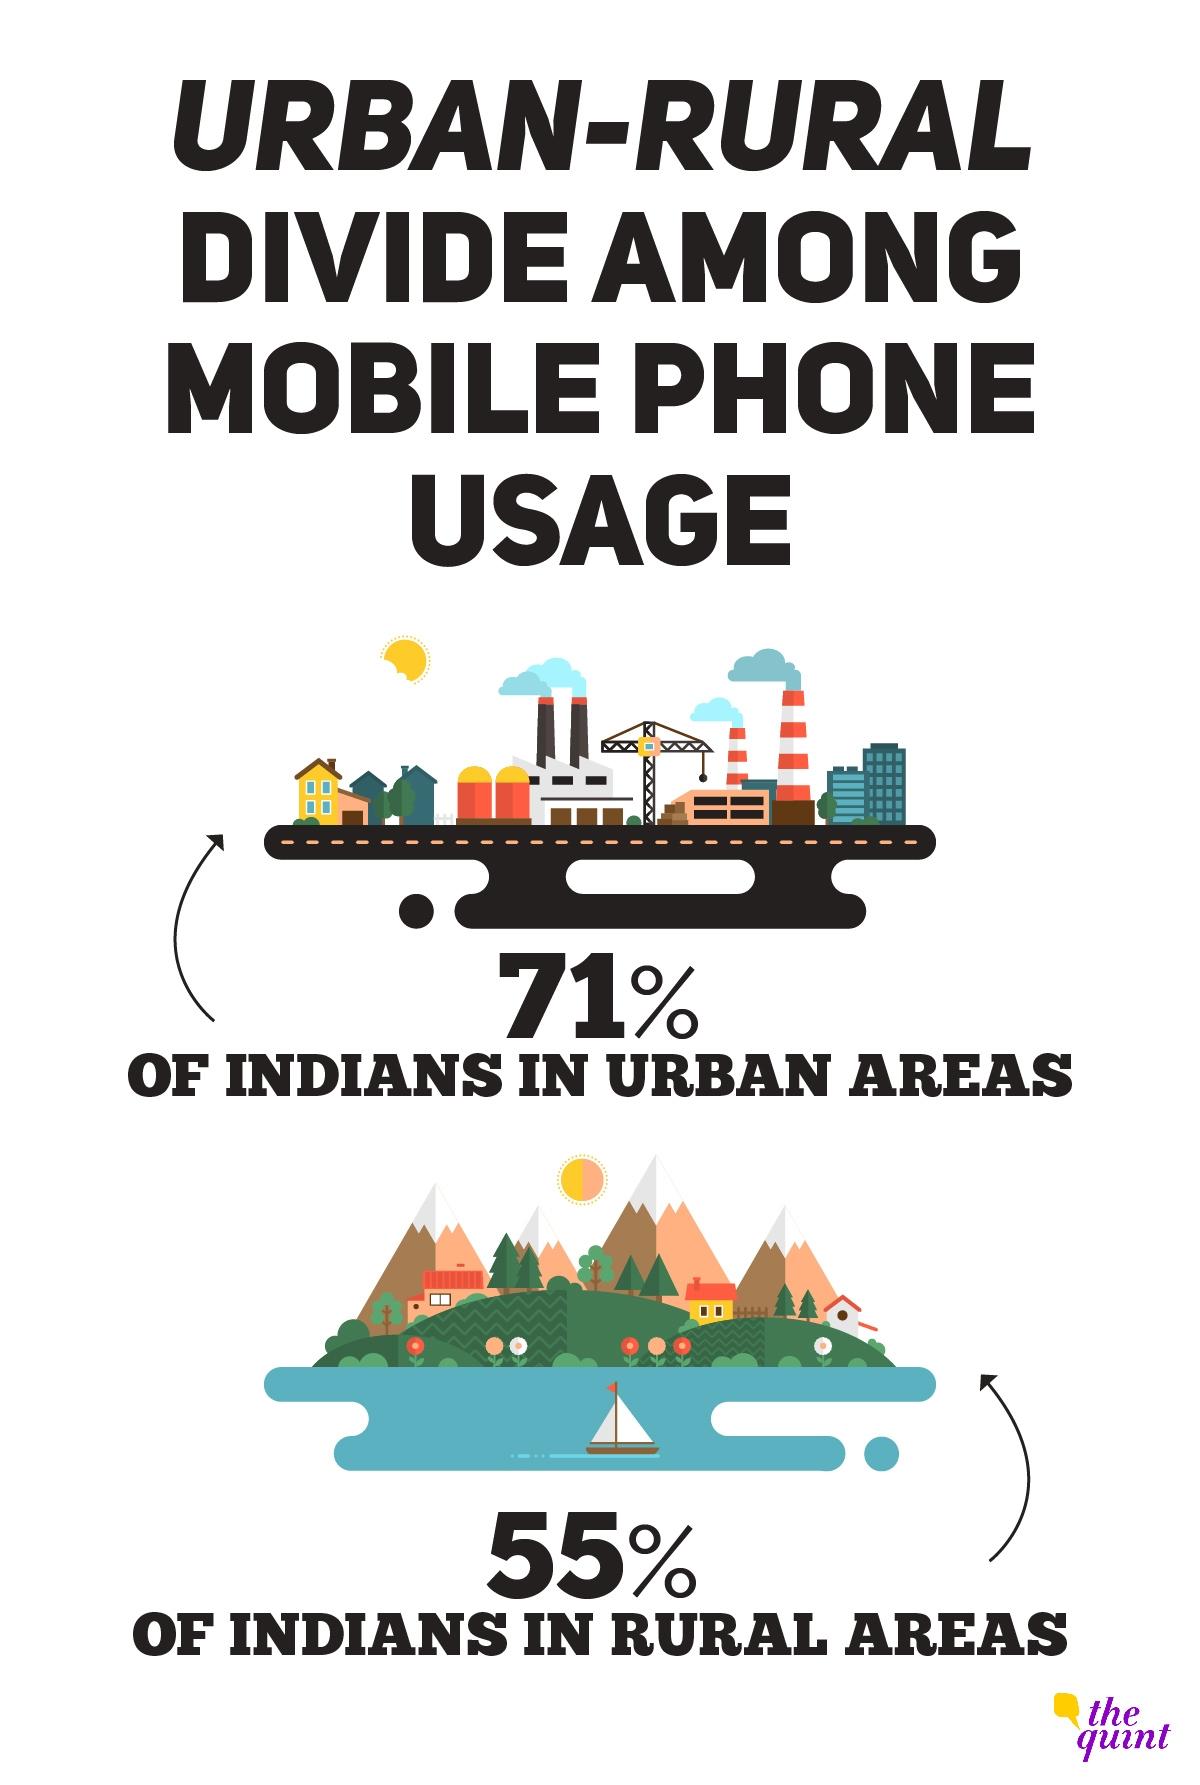 Urban-rural divide in mobile phone usage.